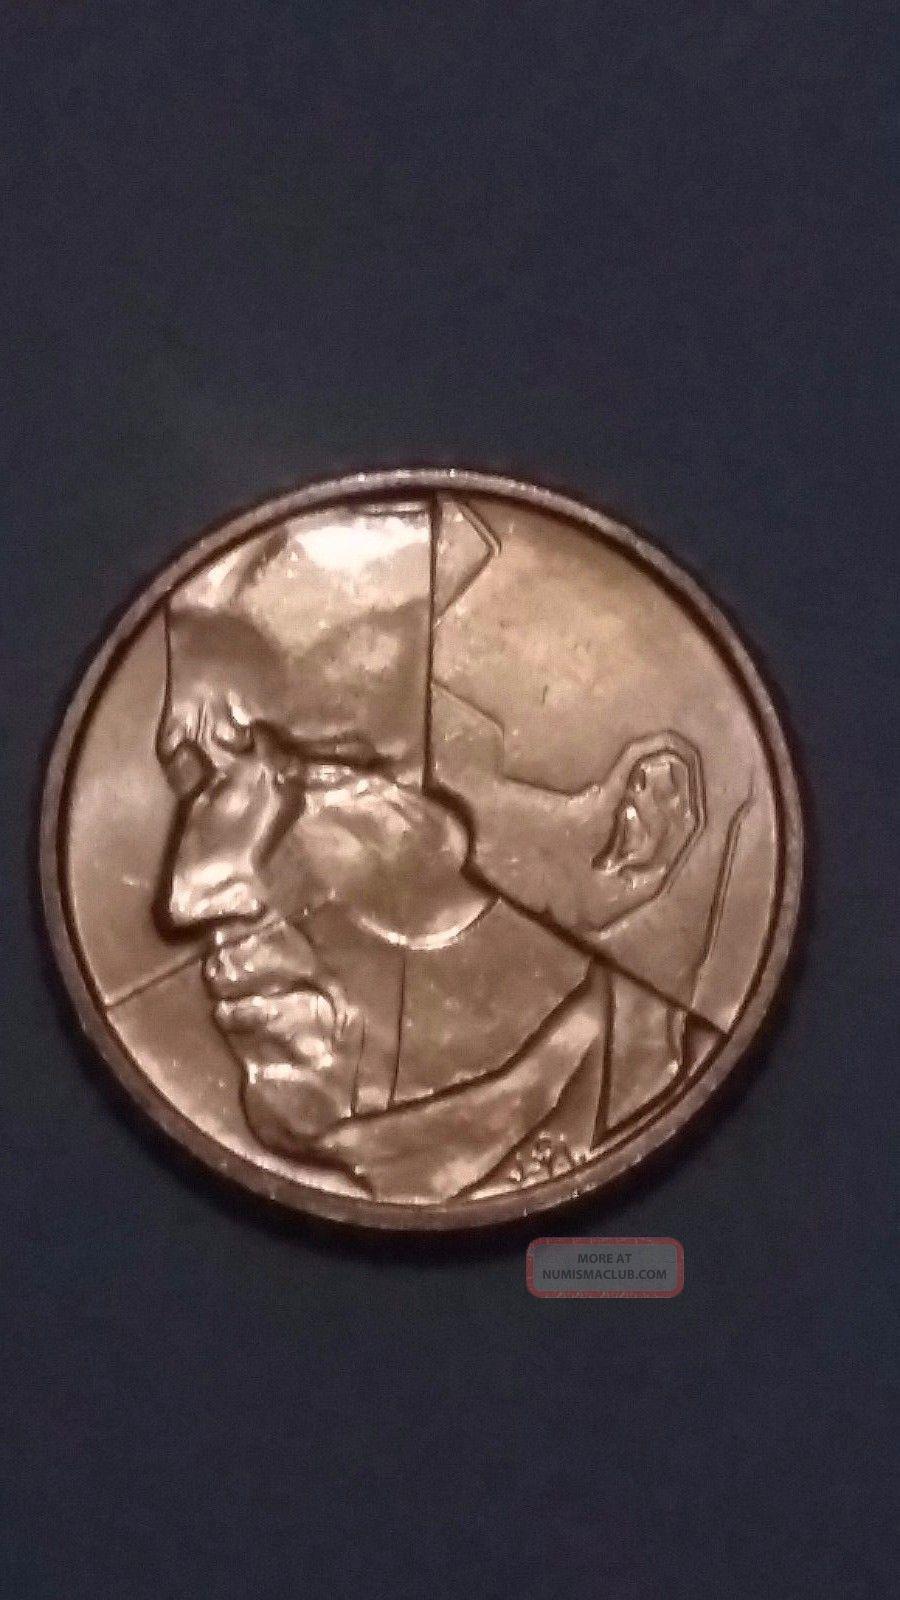 Belgium 50 Francs,  50 Frank,  1987 Belgium photo